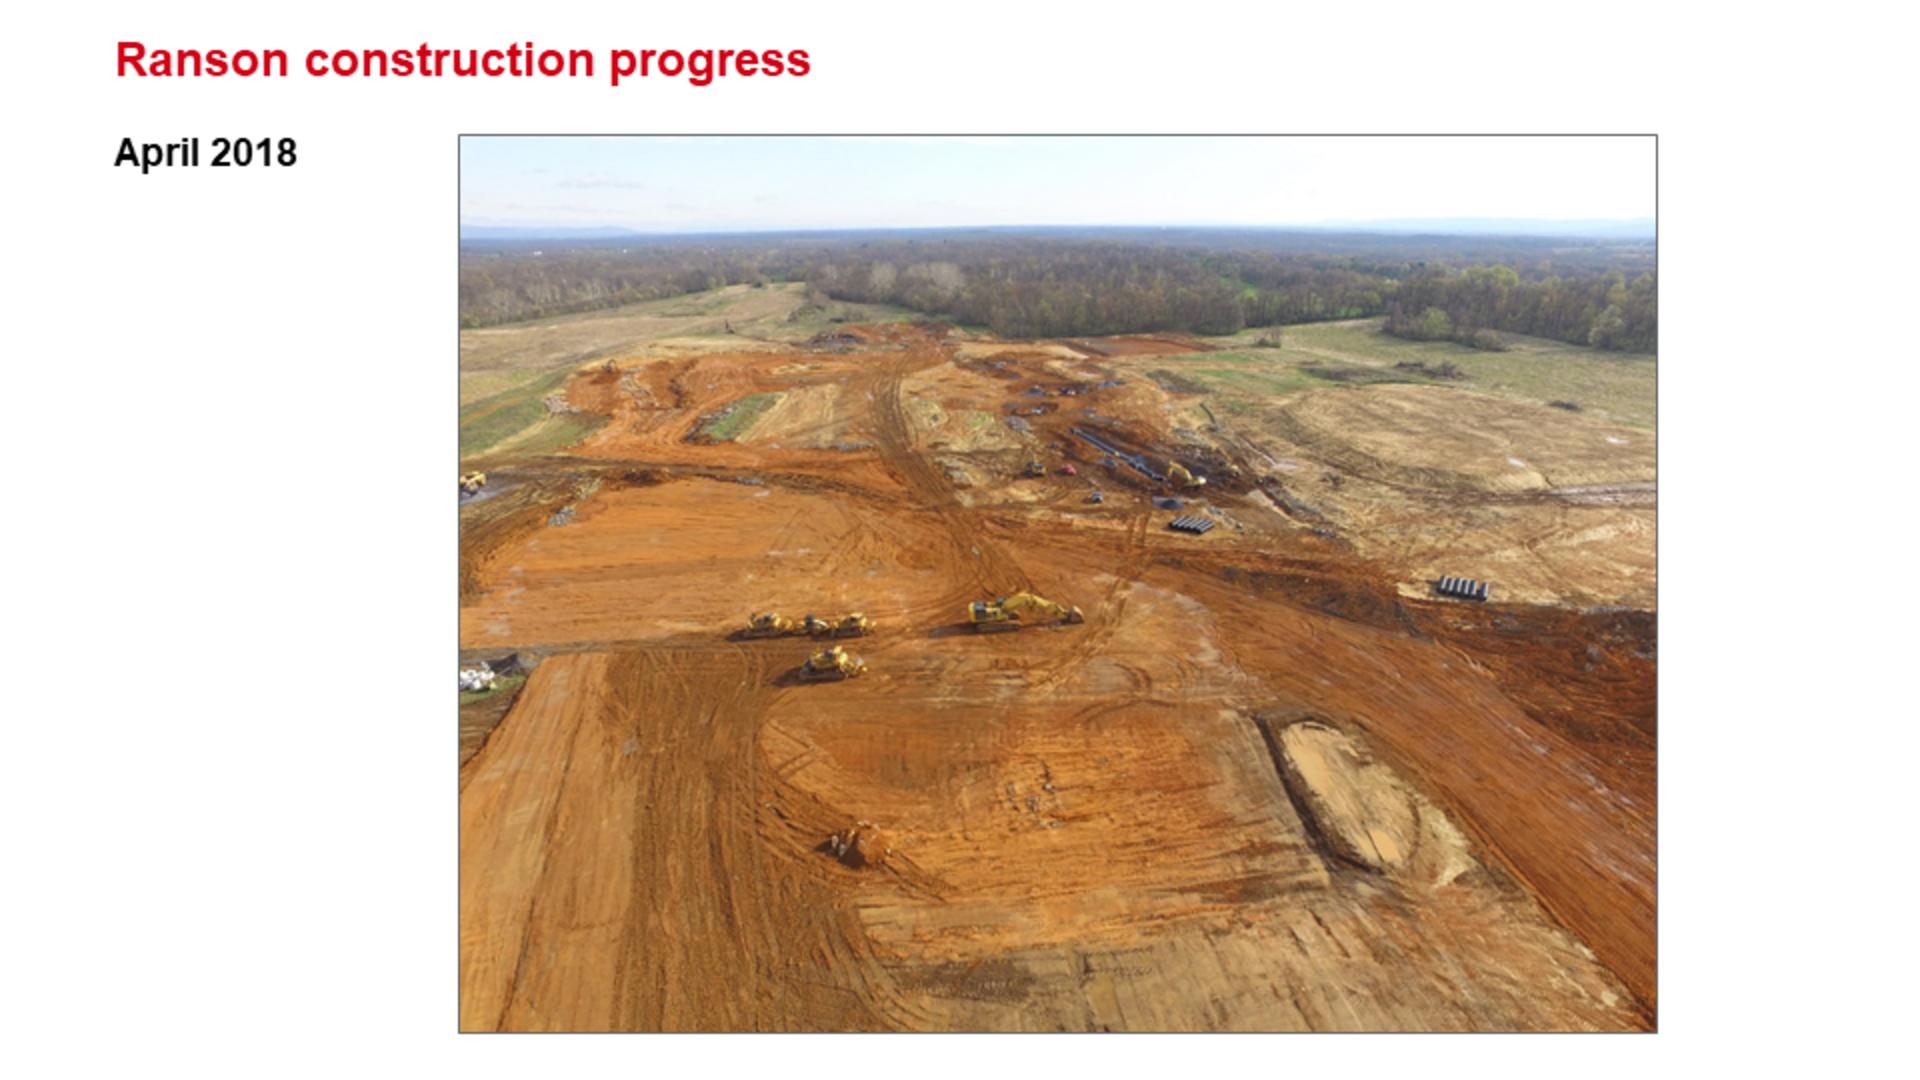 ROCKWOOL Ranson (Jefferson County) WV Construction Progress April 2018.